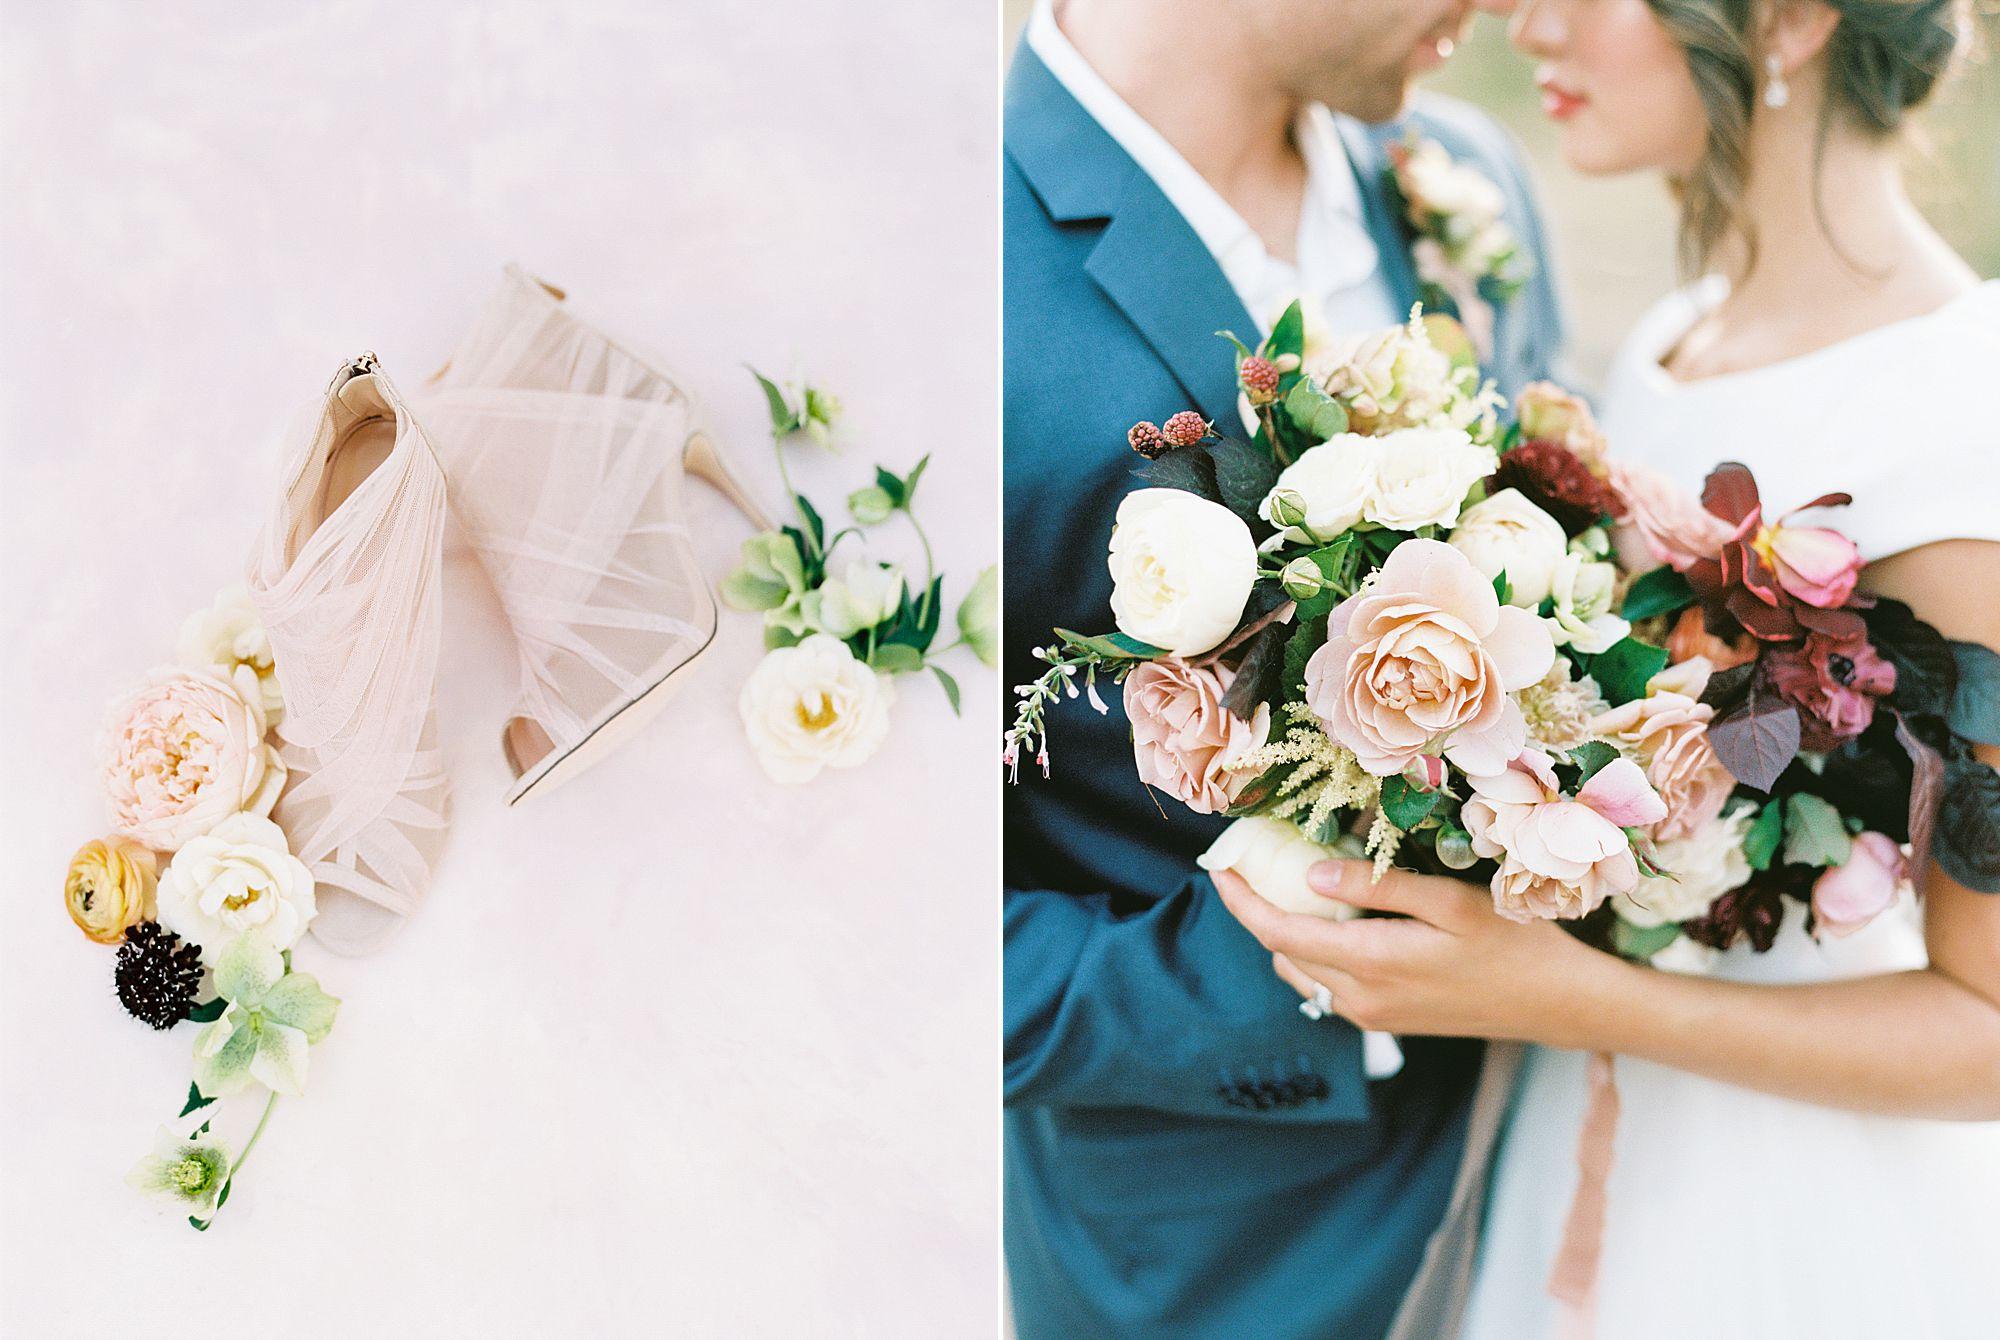 HammerSky Wedding Inspiration Featured on Hey Wedding Lady with Vanessa Noel Events - Ashley Baumgartner - SLO Wedding Photographer_0019.jpg